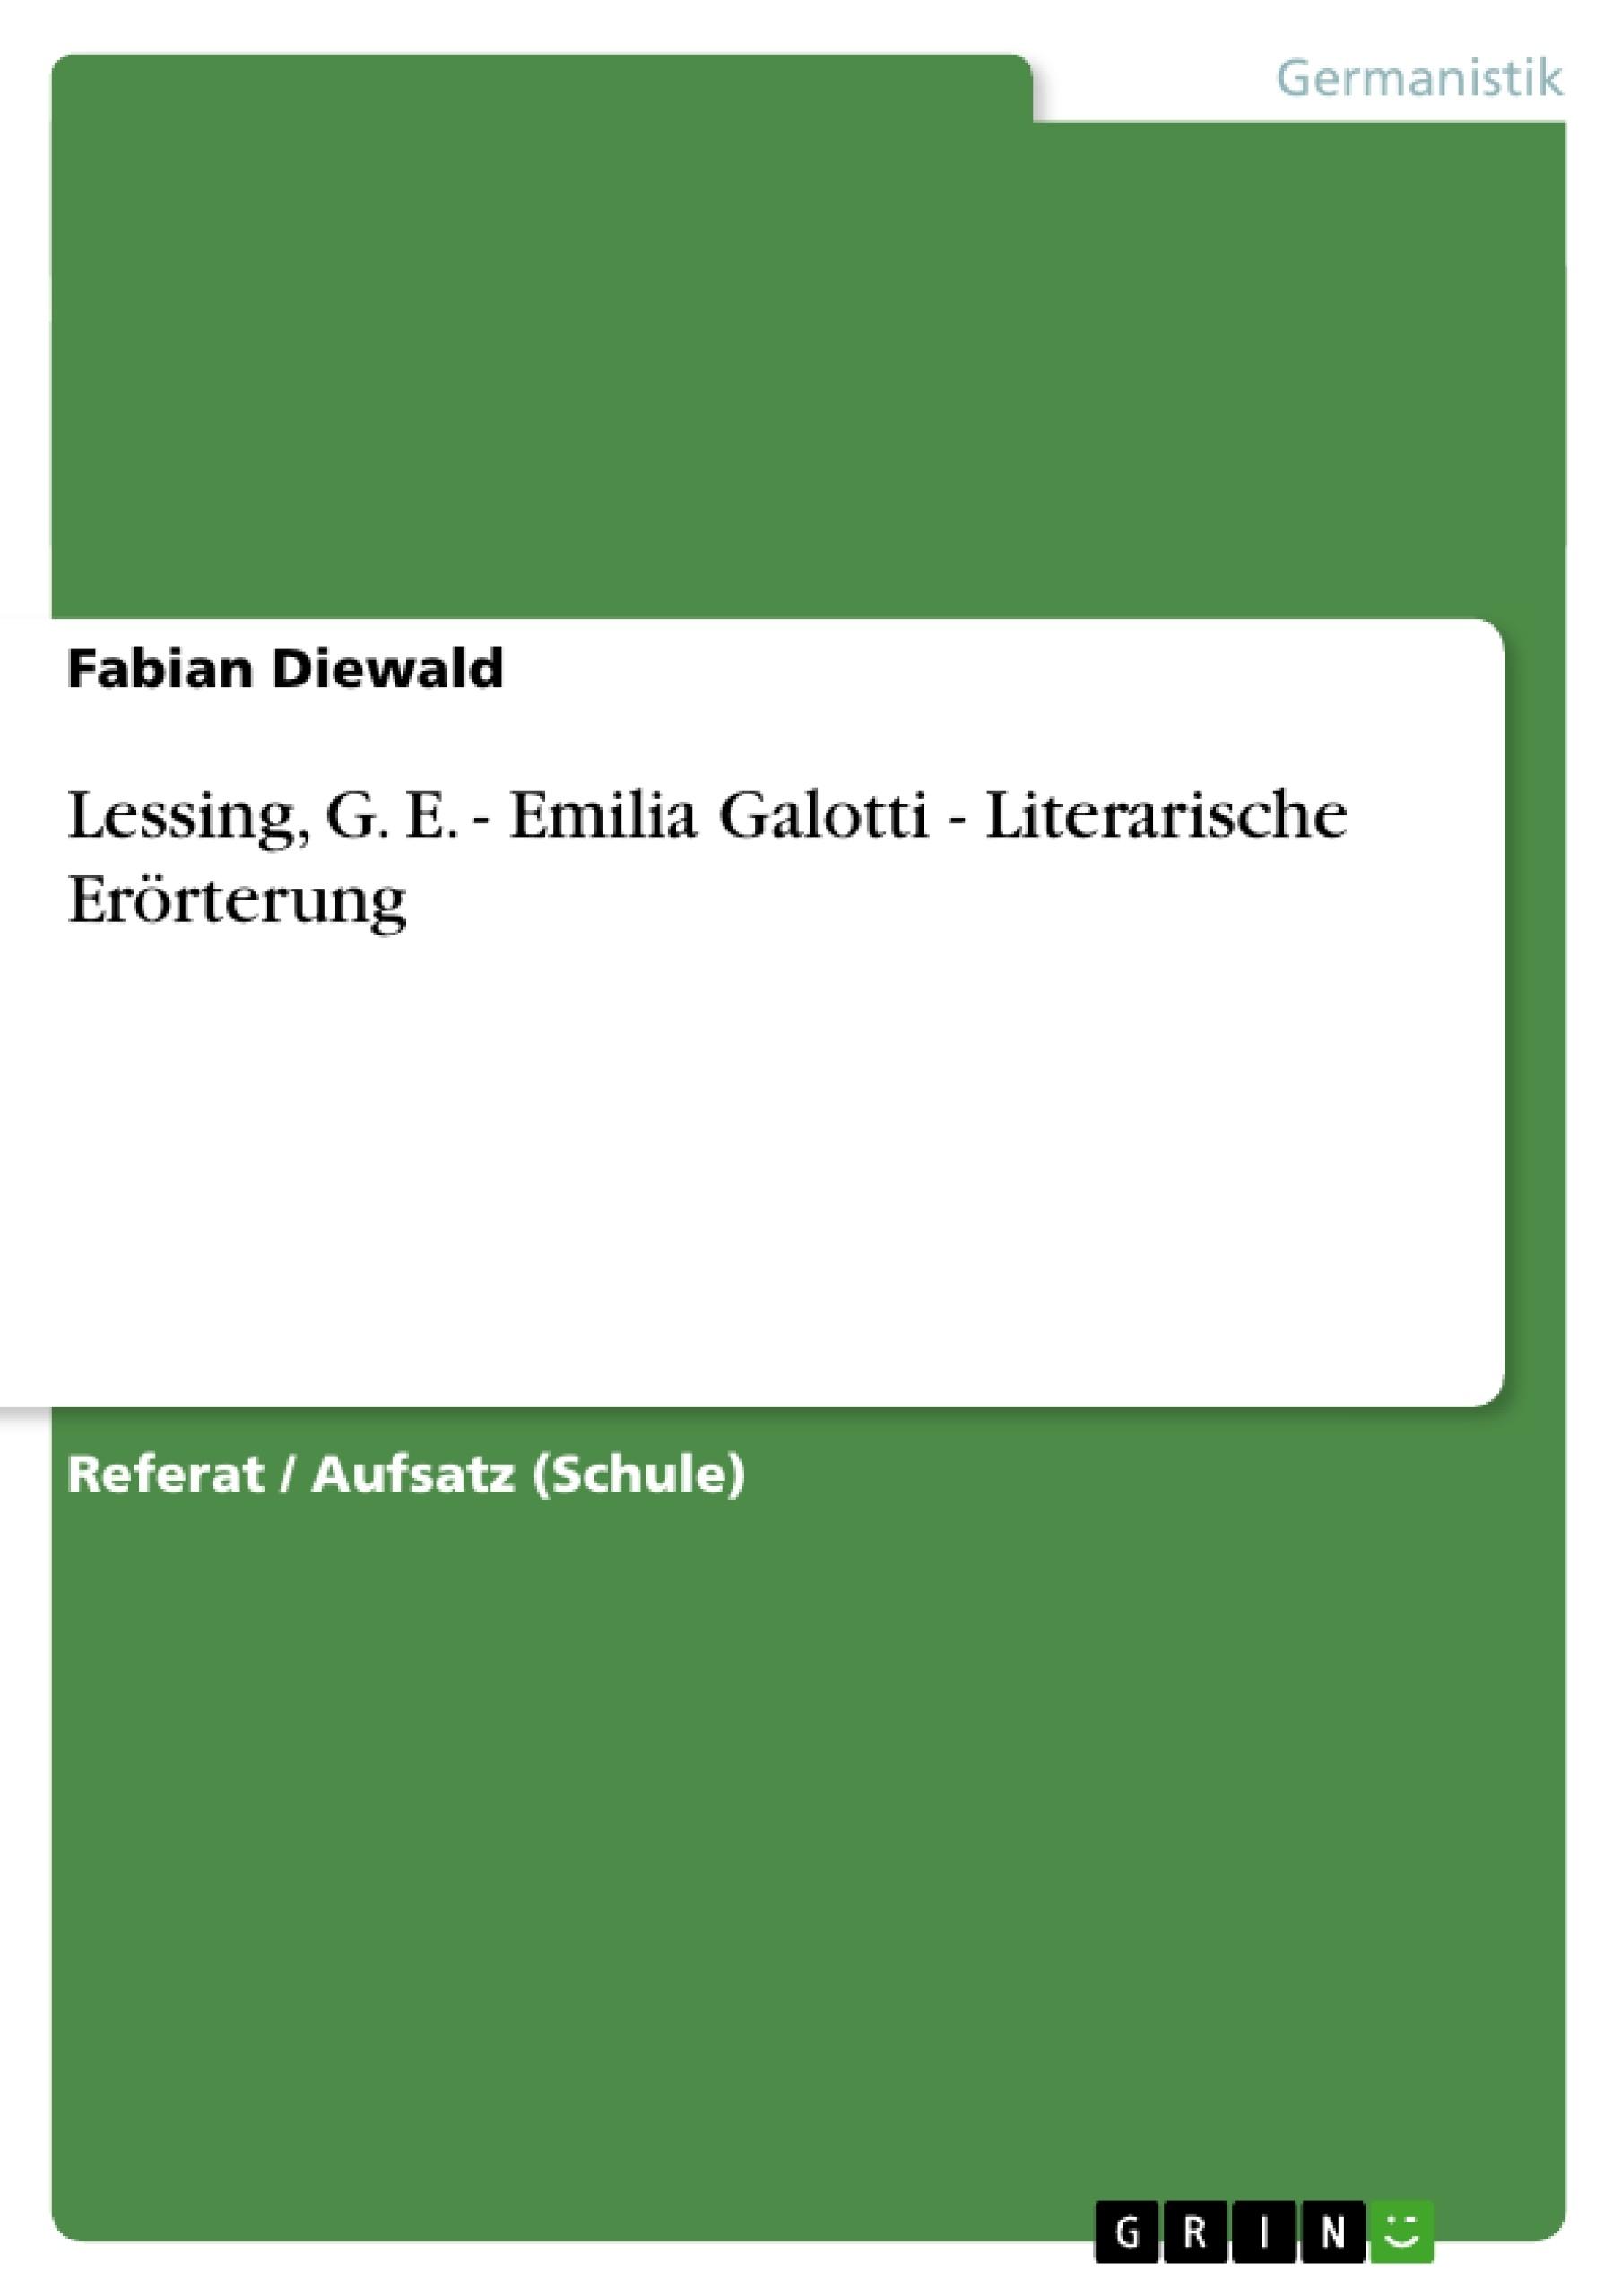 Titel: Lessing, G. E. - Emilia Galotti - Literarische Erörterung